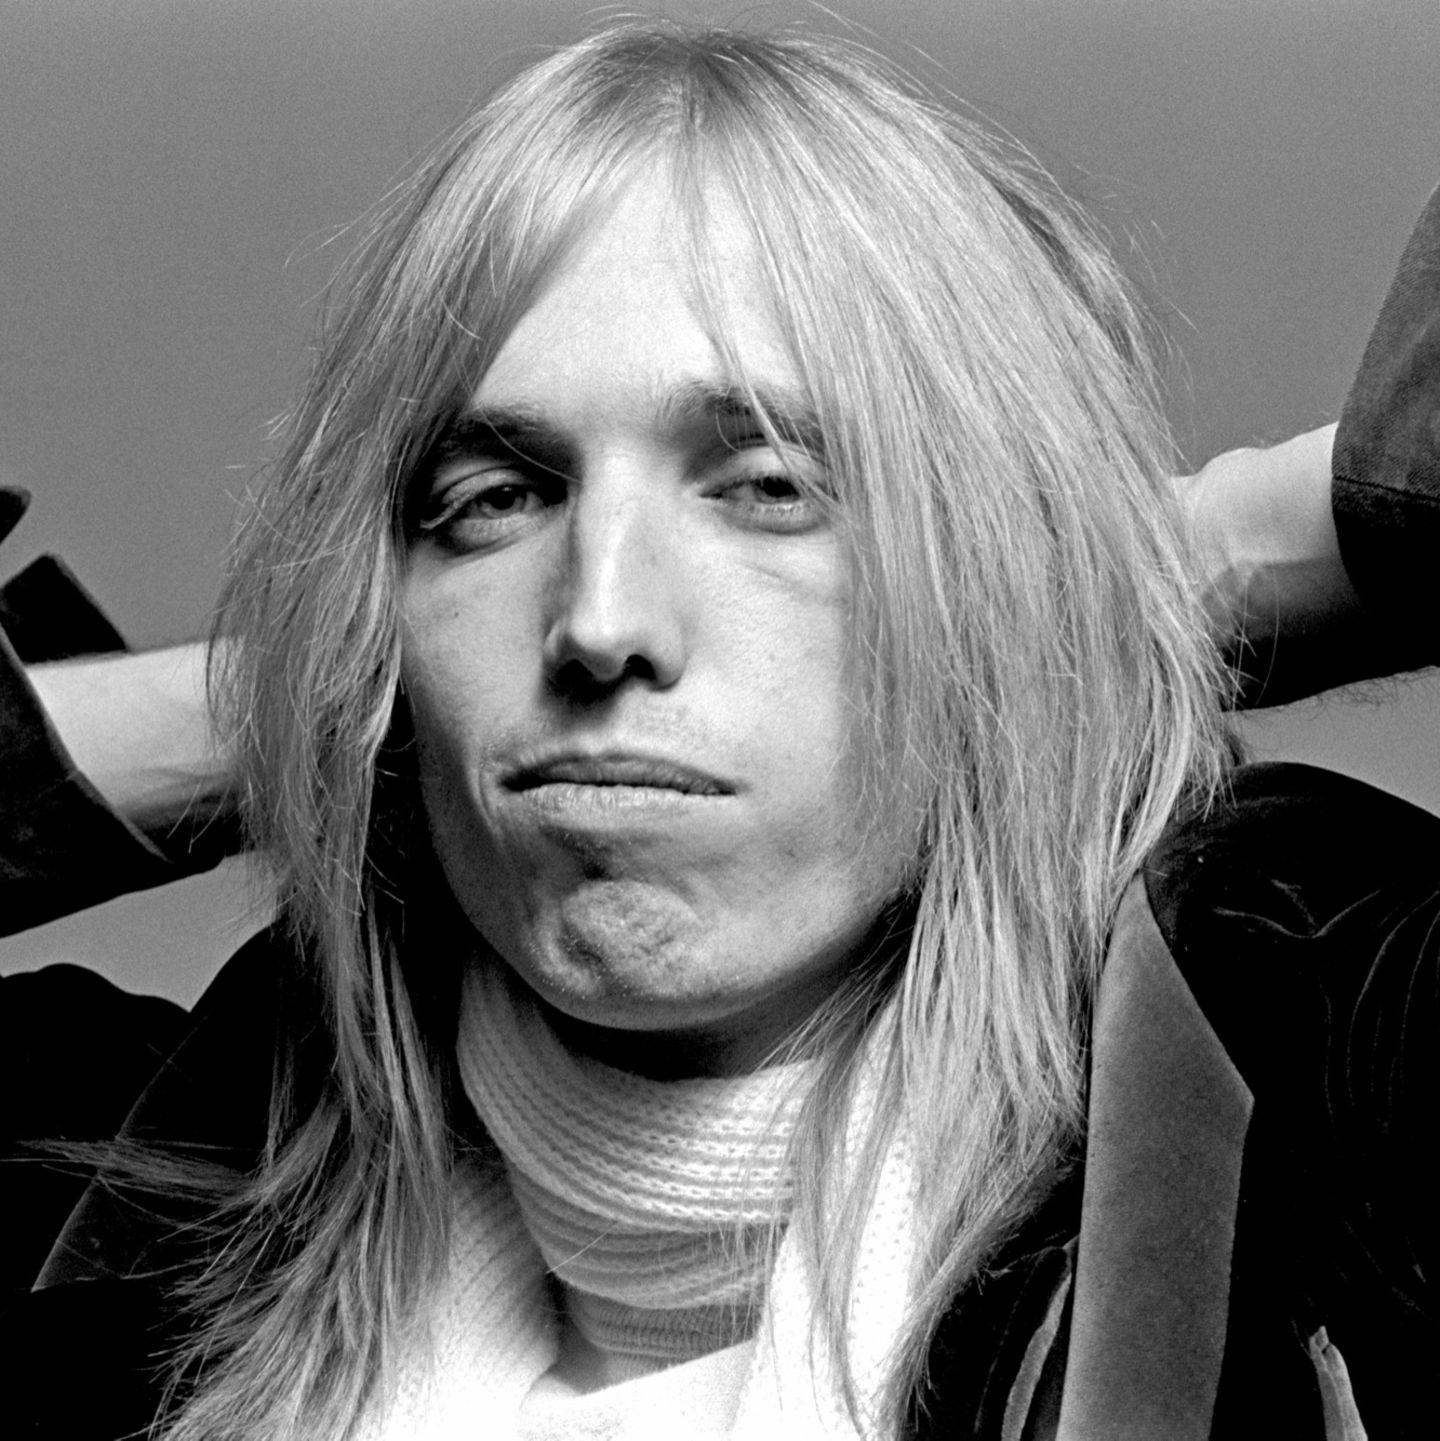 Ein Herzinfarkt riss Musiker Tom Petty am 2. Oktober 2017viel zu früh aus dem Leben. Zu den größten Hits des US-Sängers zählen 'Free Fallin' oder 'I Won't Back Down'.